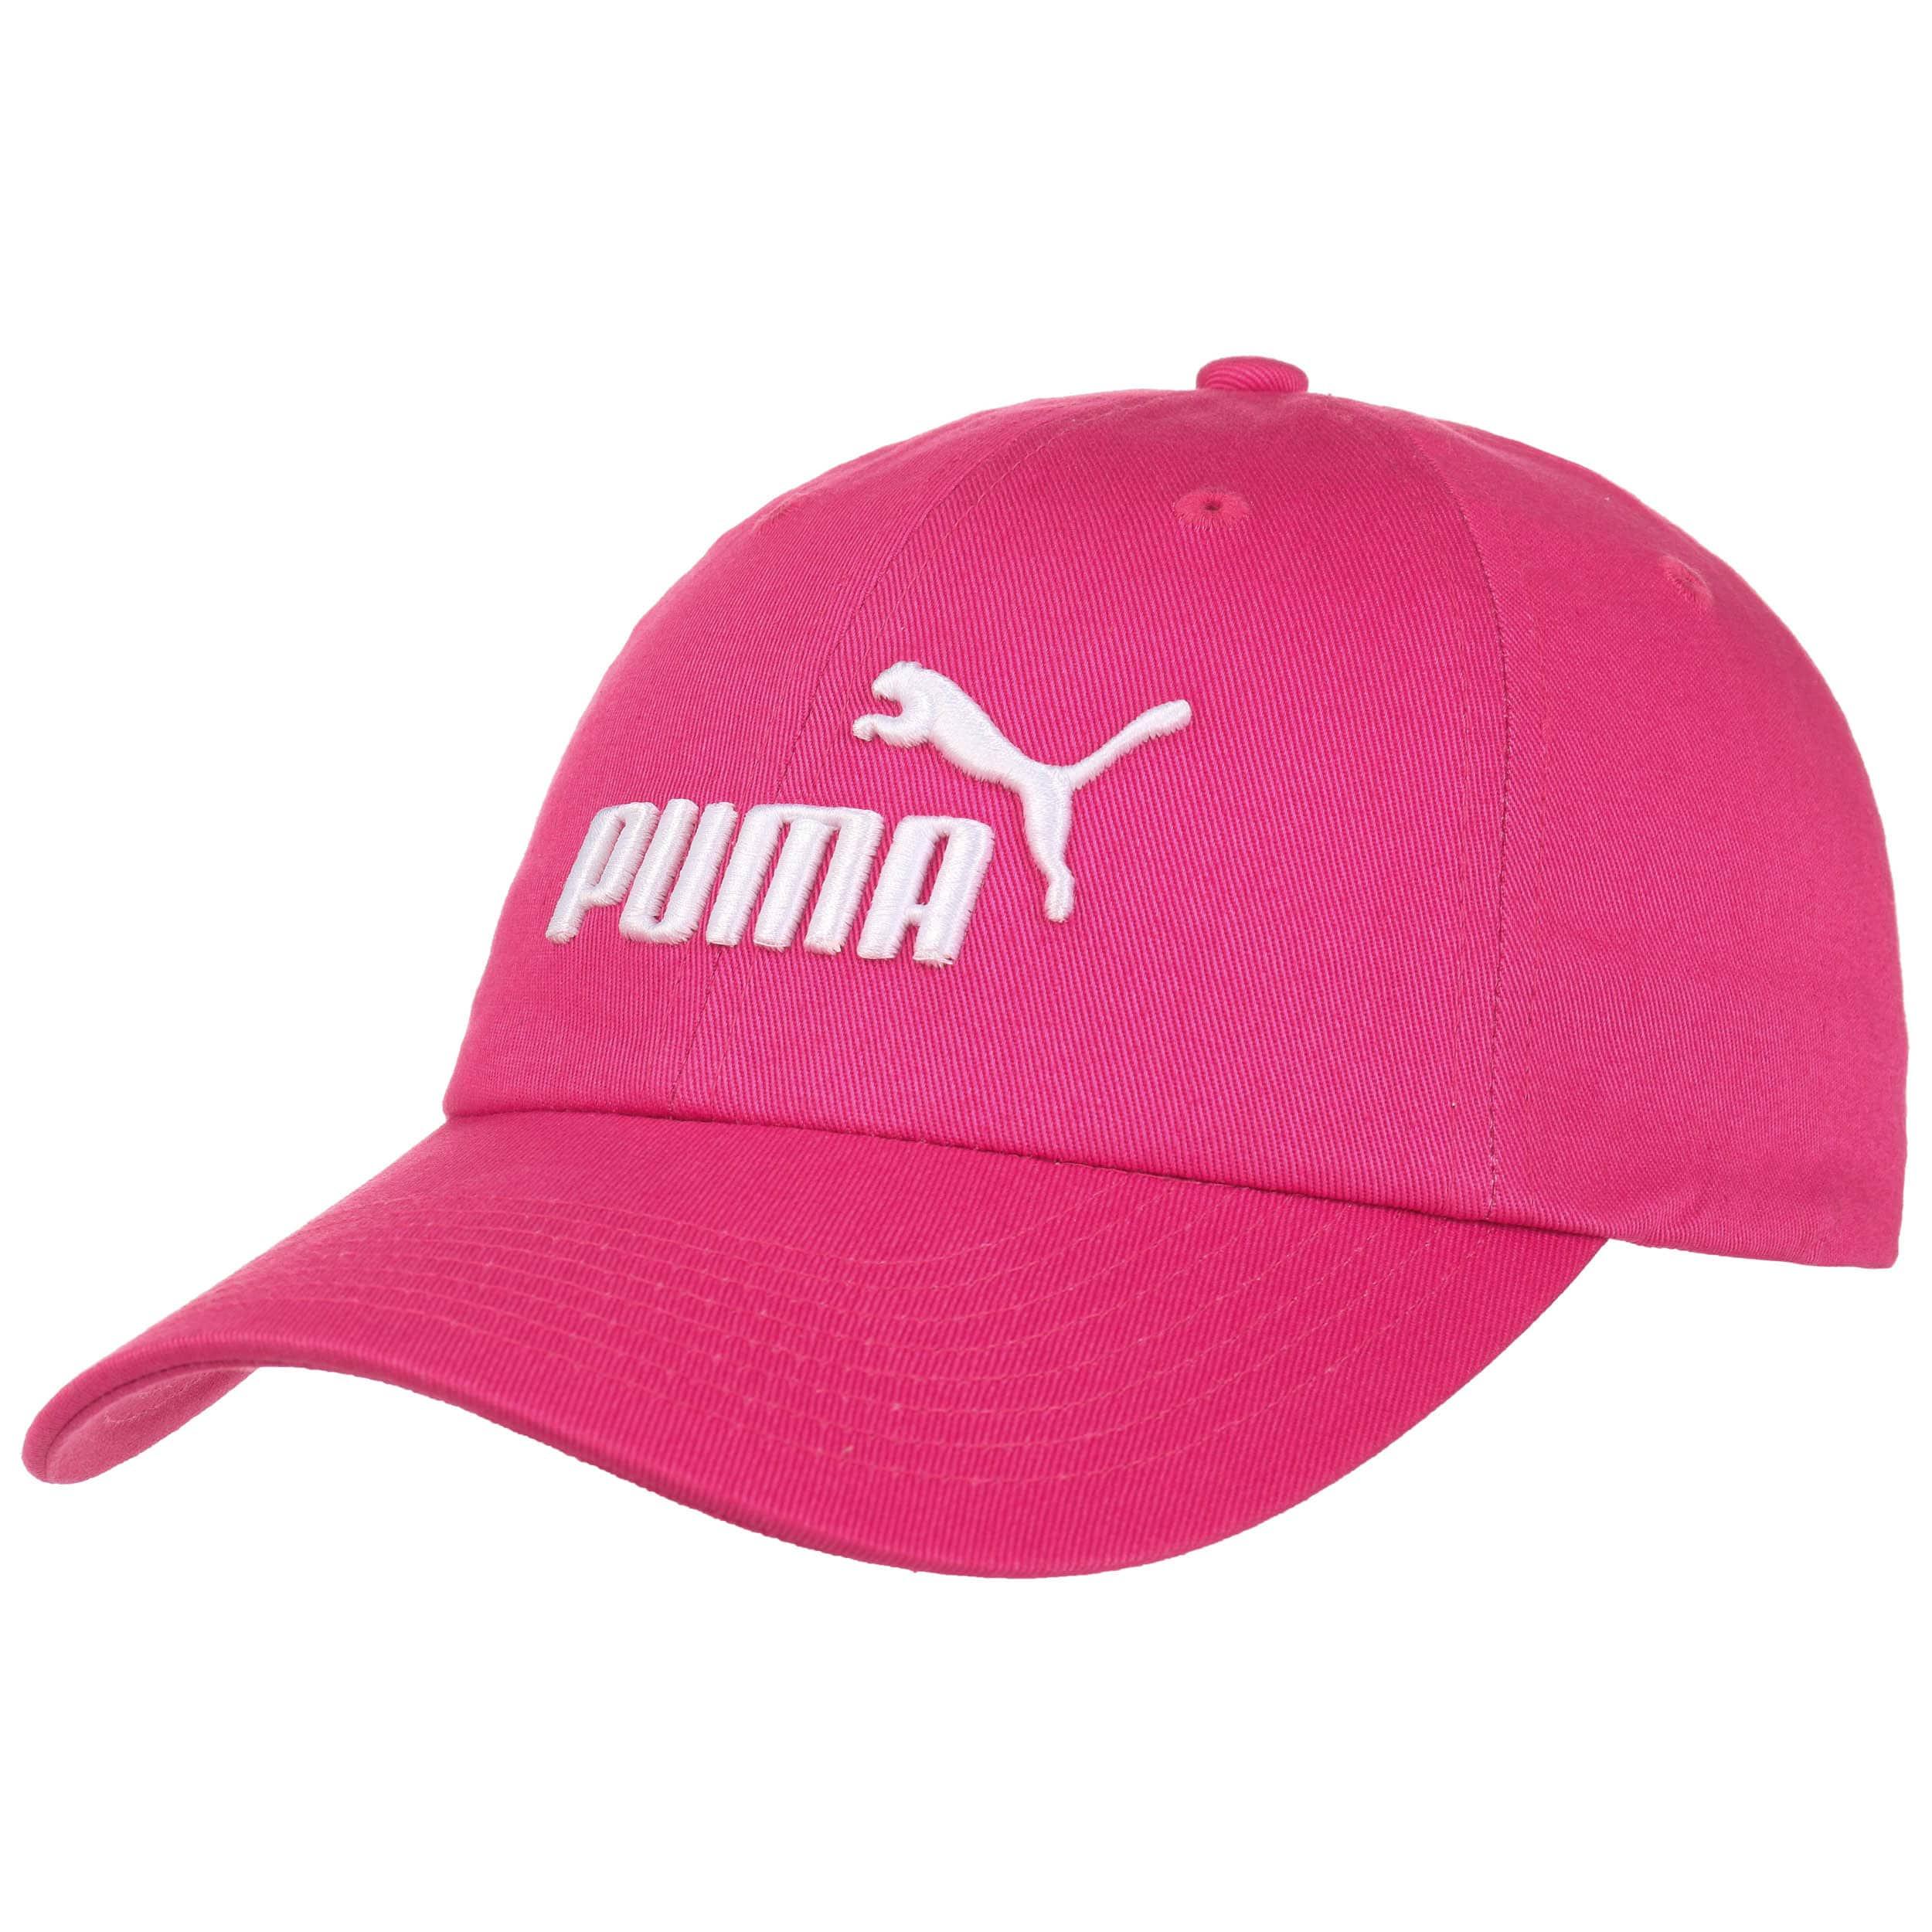 1 Baseball Cap by PUMA - mint green 5 ff2b112b3ac